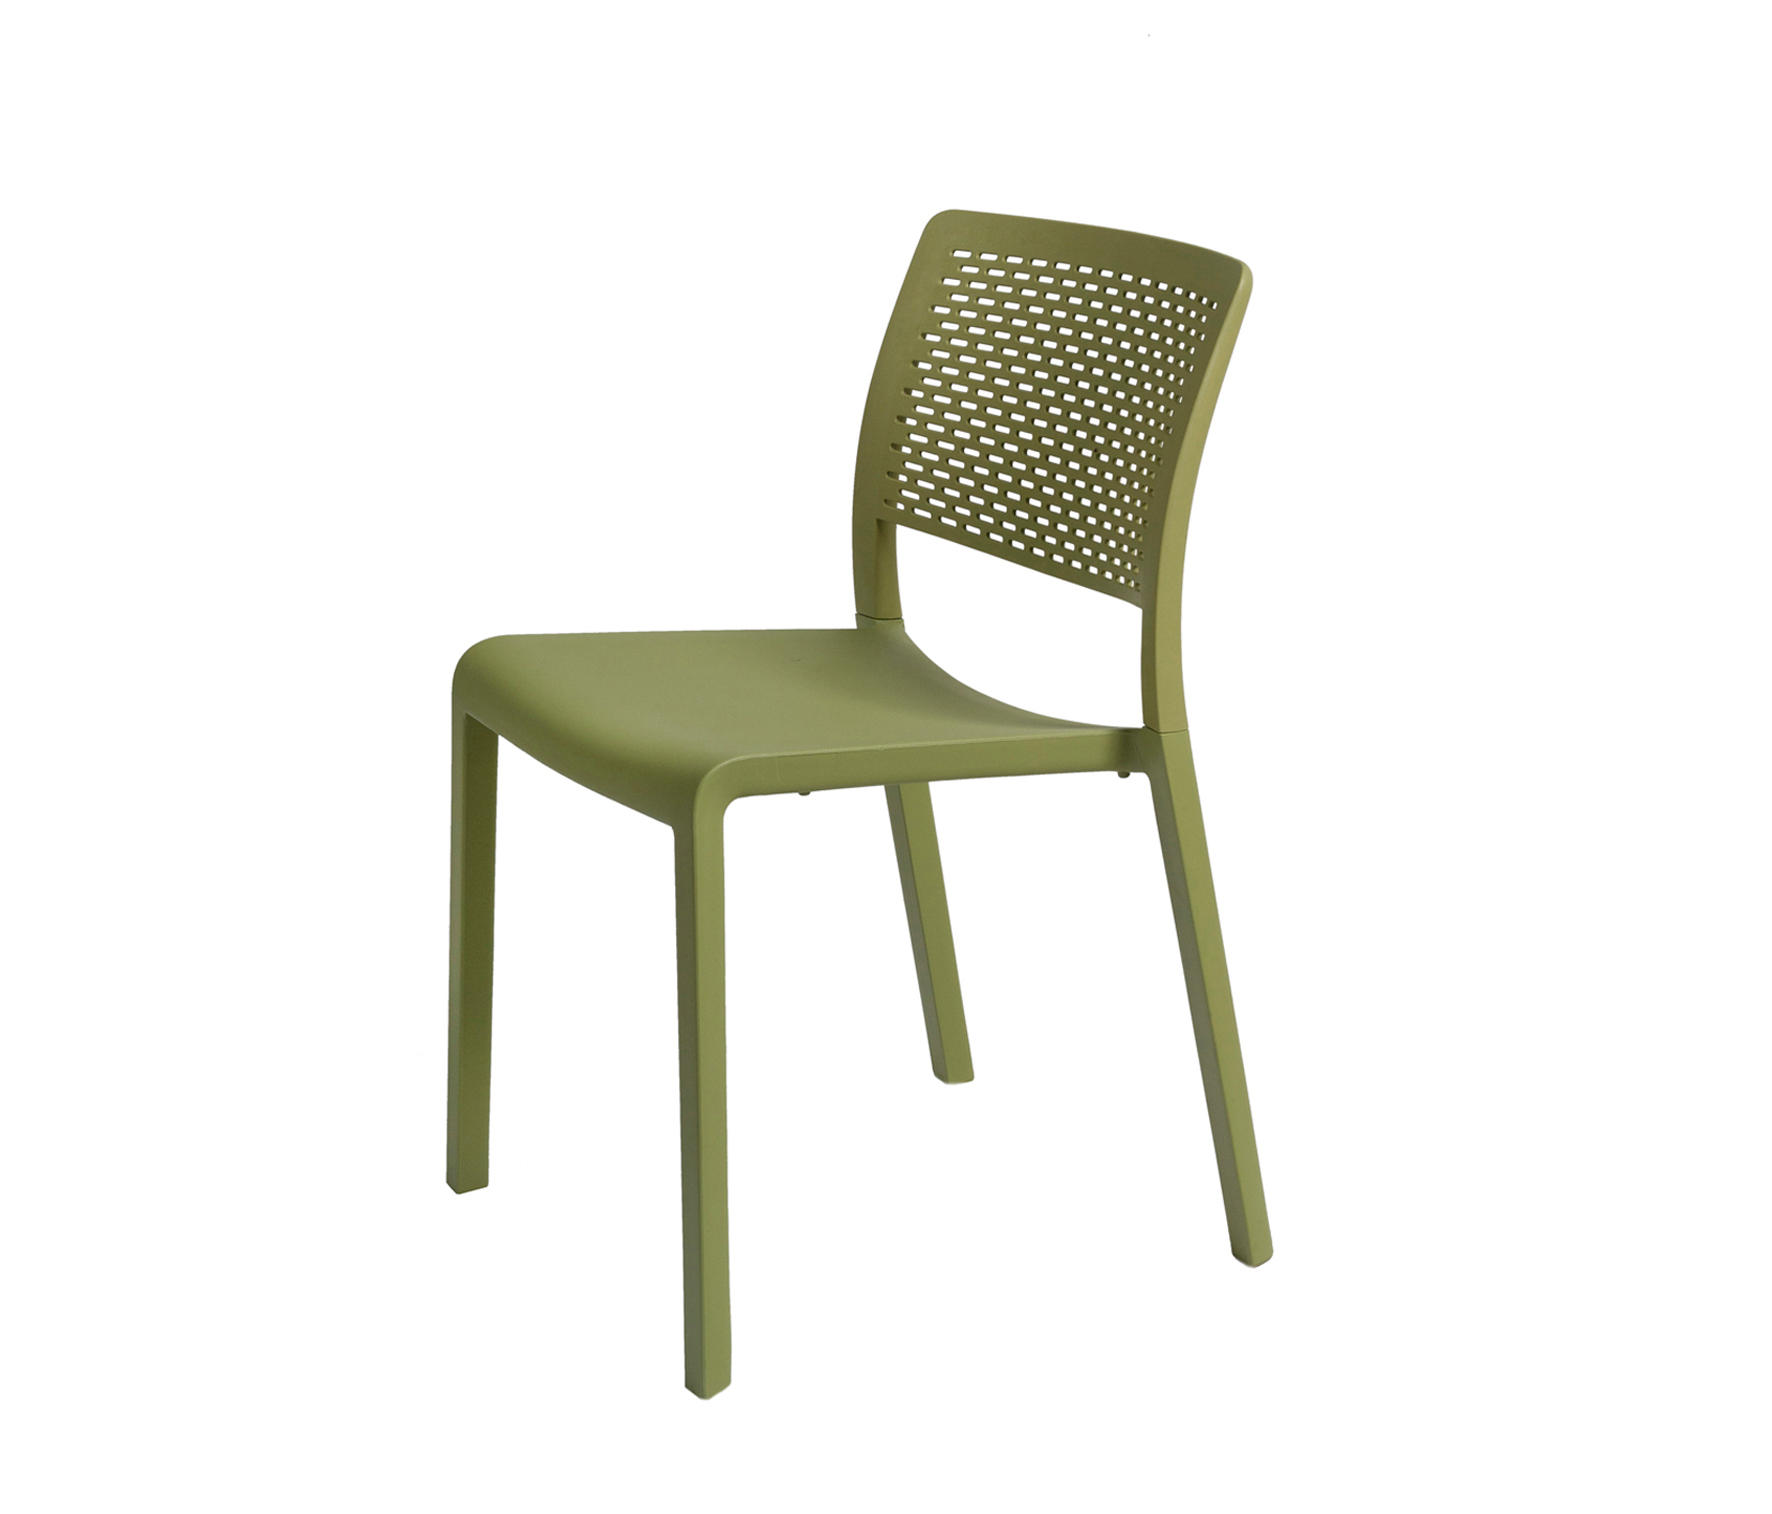 Kaufen sie serralunga barceloneta auf arredatutto.com. TRAMA STUHL - Stühle von Resol-Barcelona Dd   Architonic